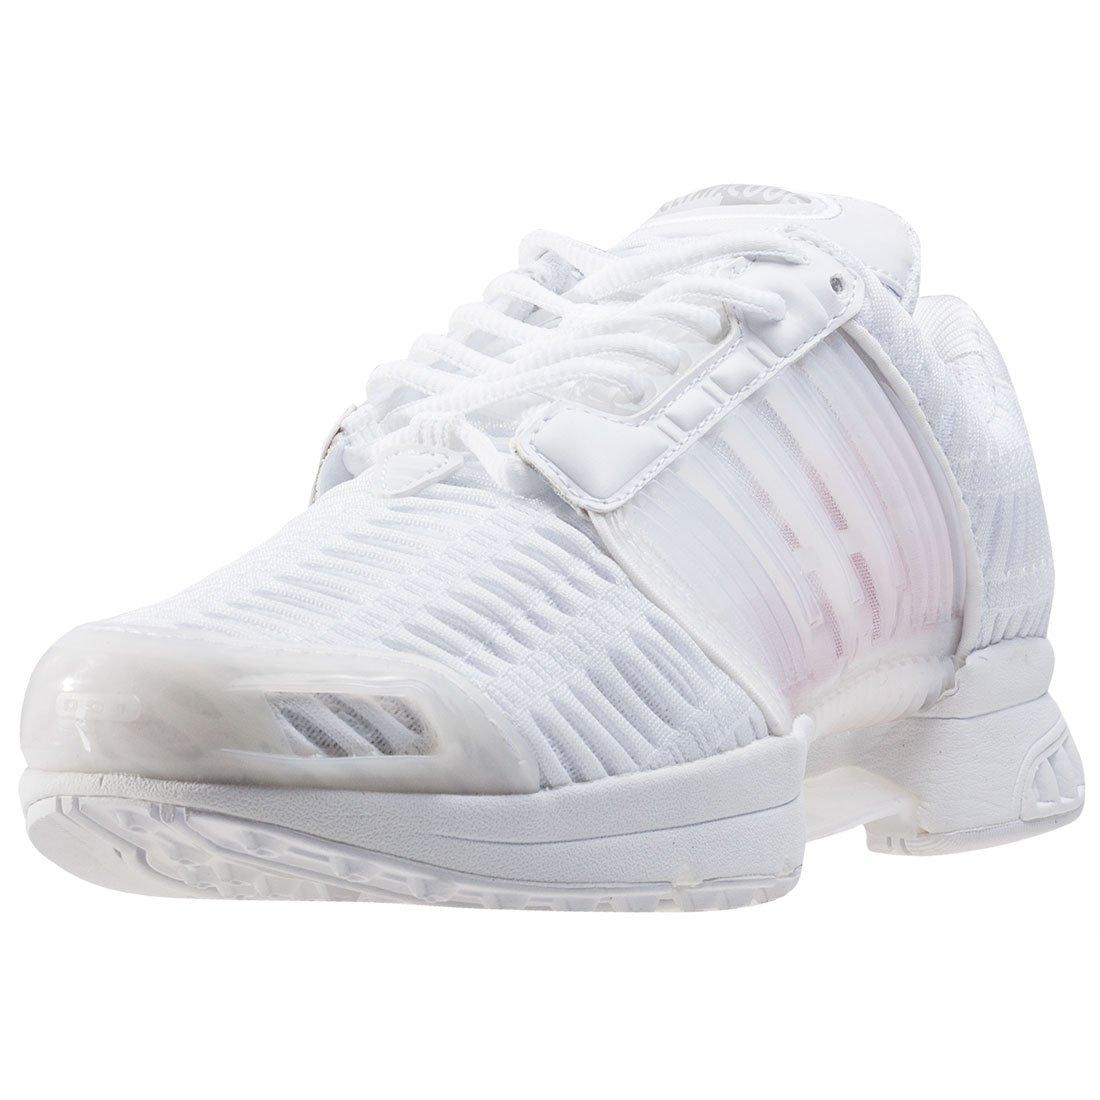 Tragbar Damen Schuhe adidas Topanga Schuhe beige braun